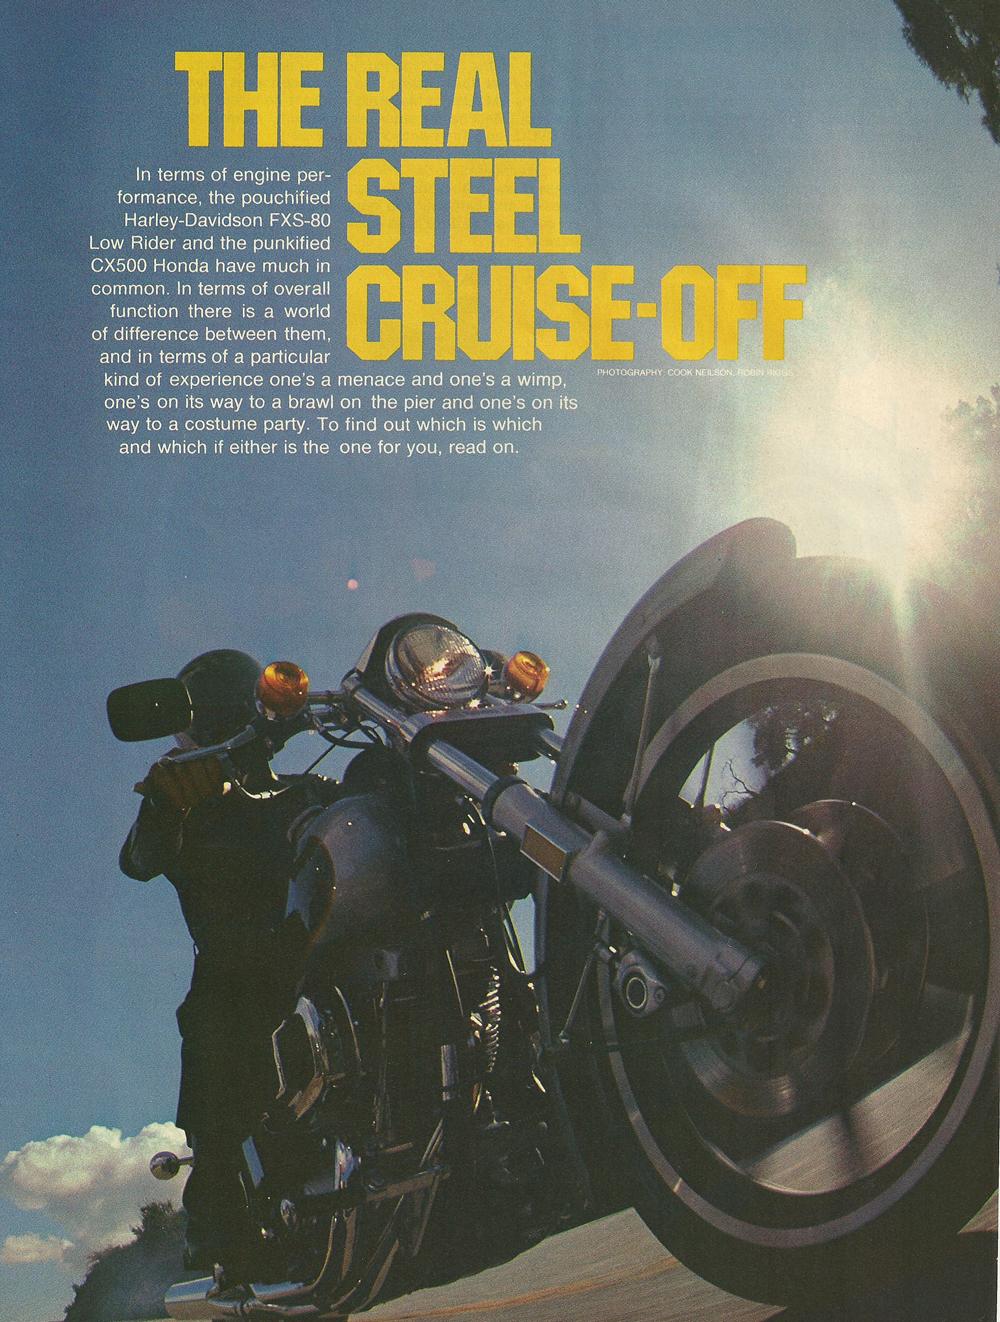 1979 Honda CX500 vs Harley FXS-80 Lowrider 1.jpg